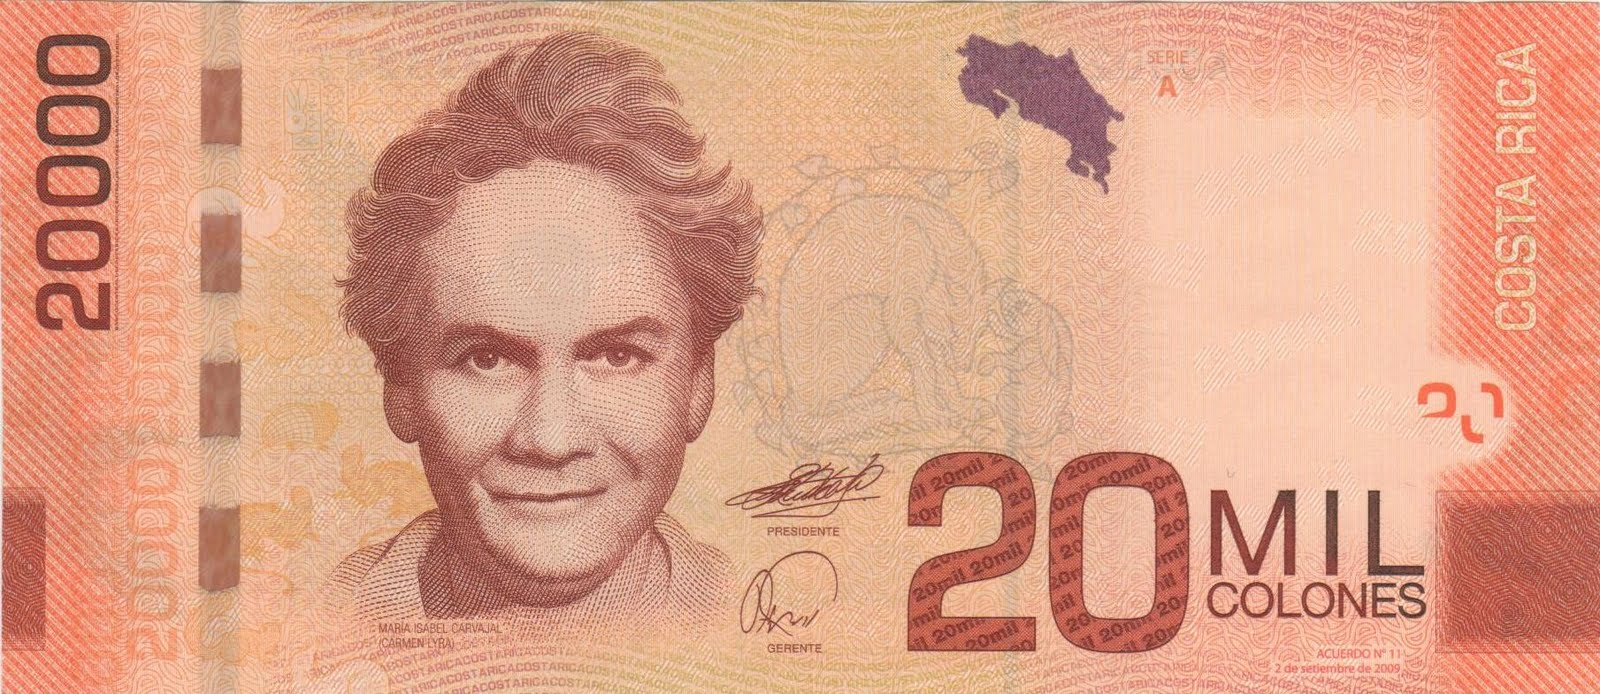 costa-rican-20-mil.jpg